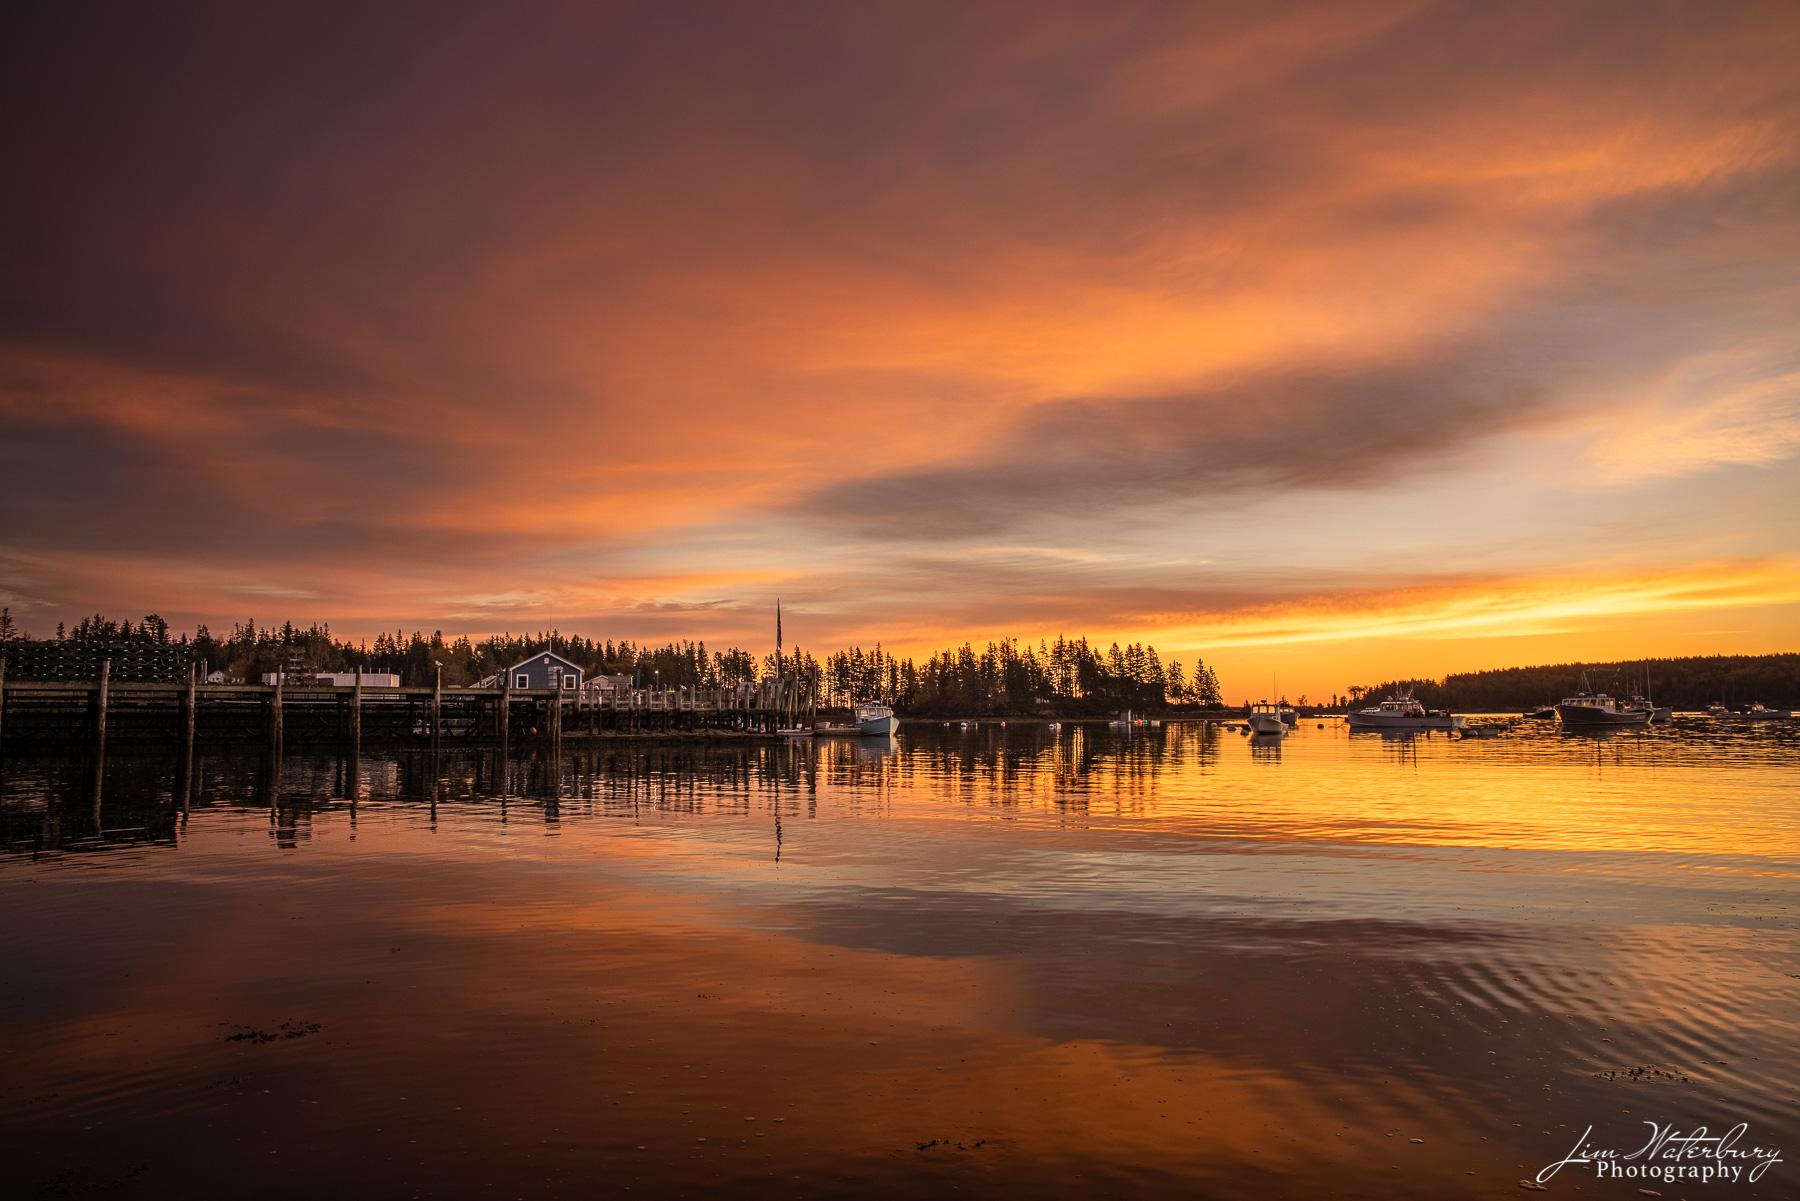 Sunrise over the small harbor of Owl's Head, Maine.